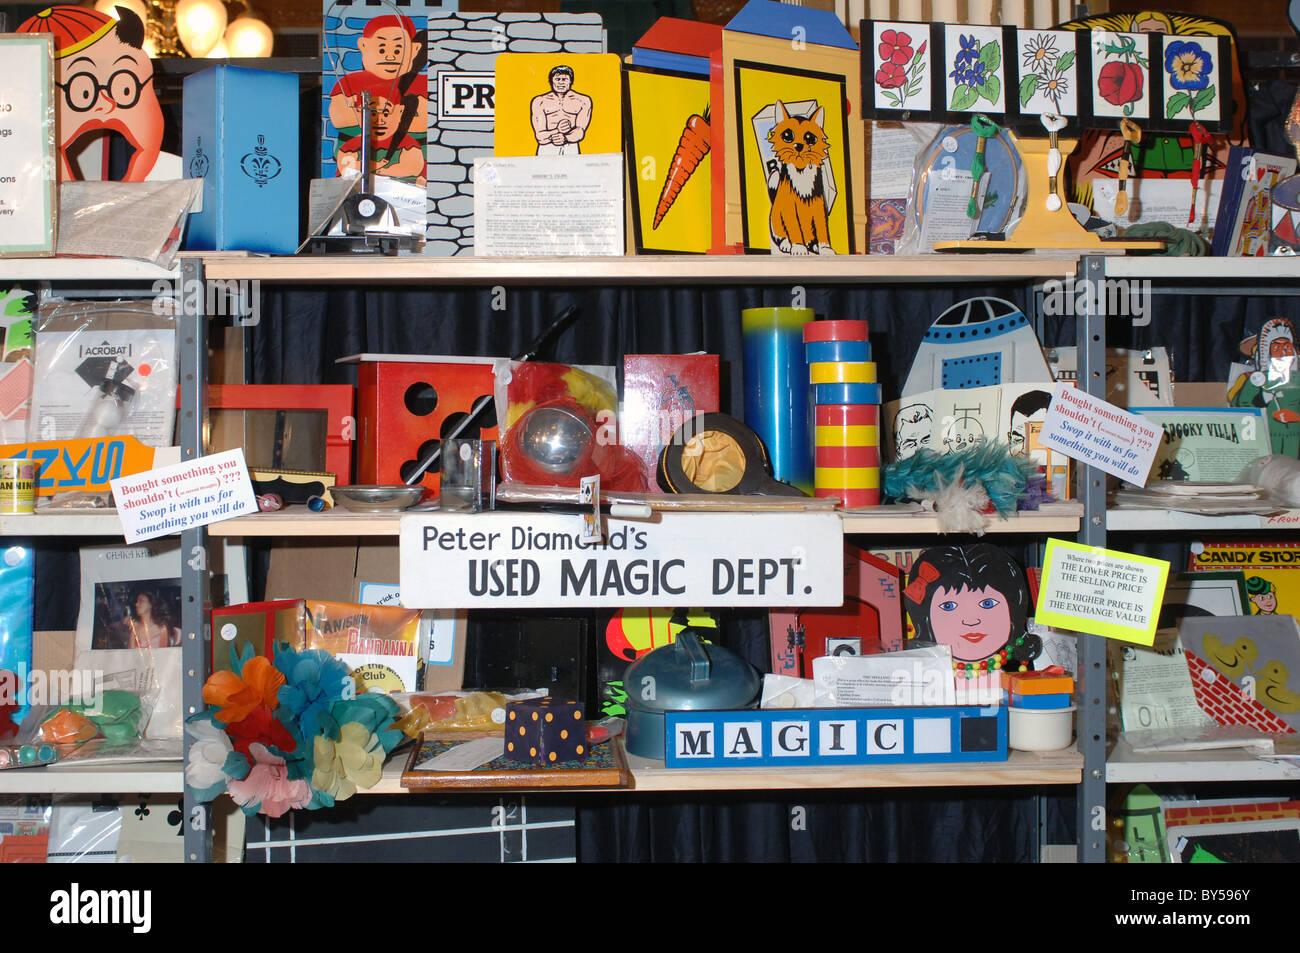 Magic tricks shop and props - Stock Image